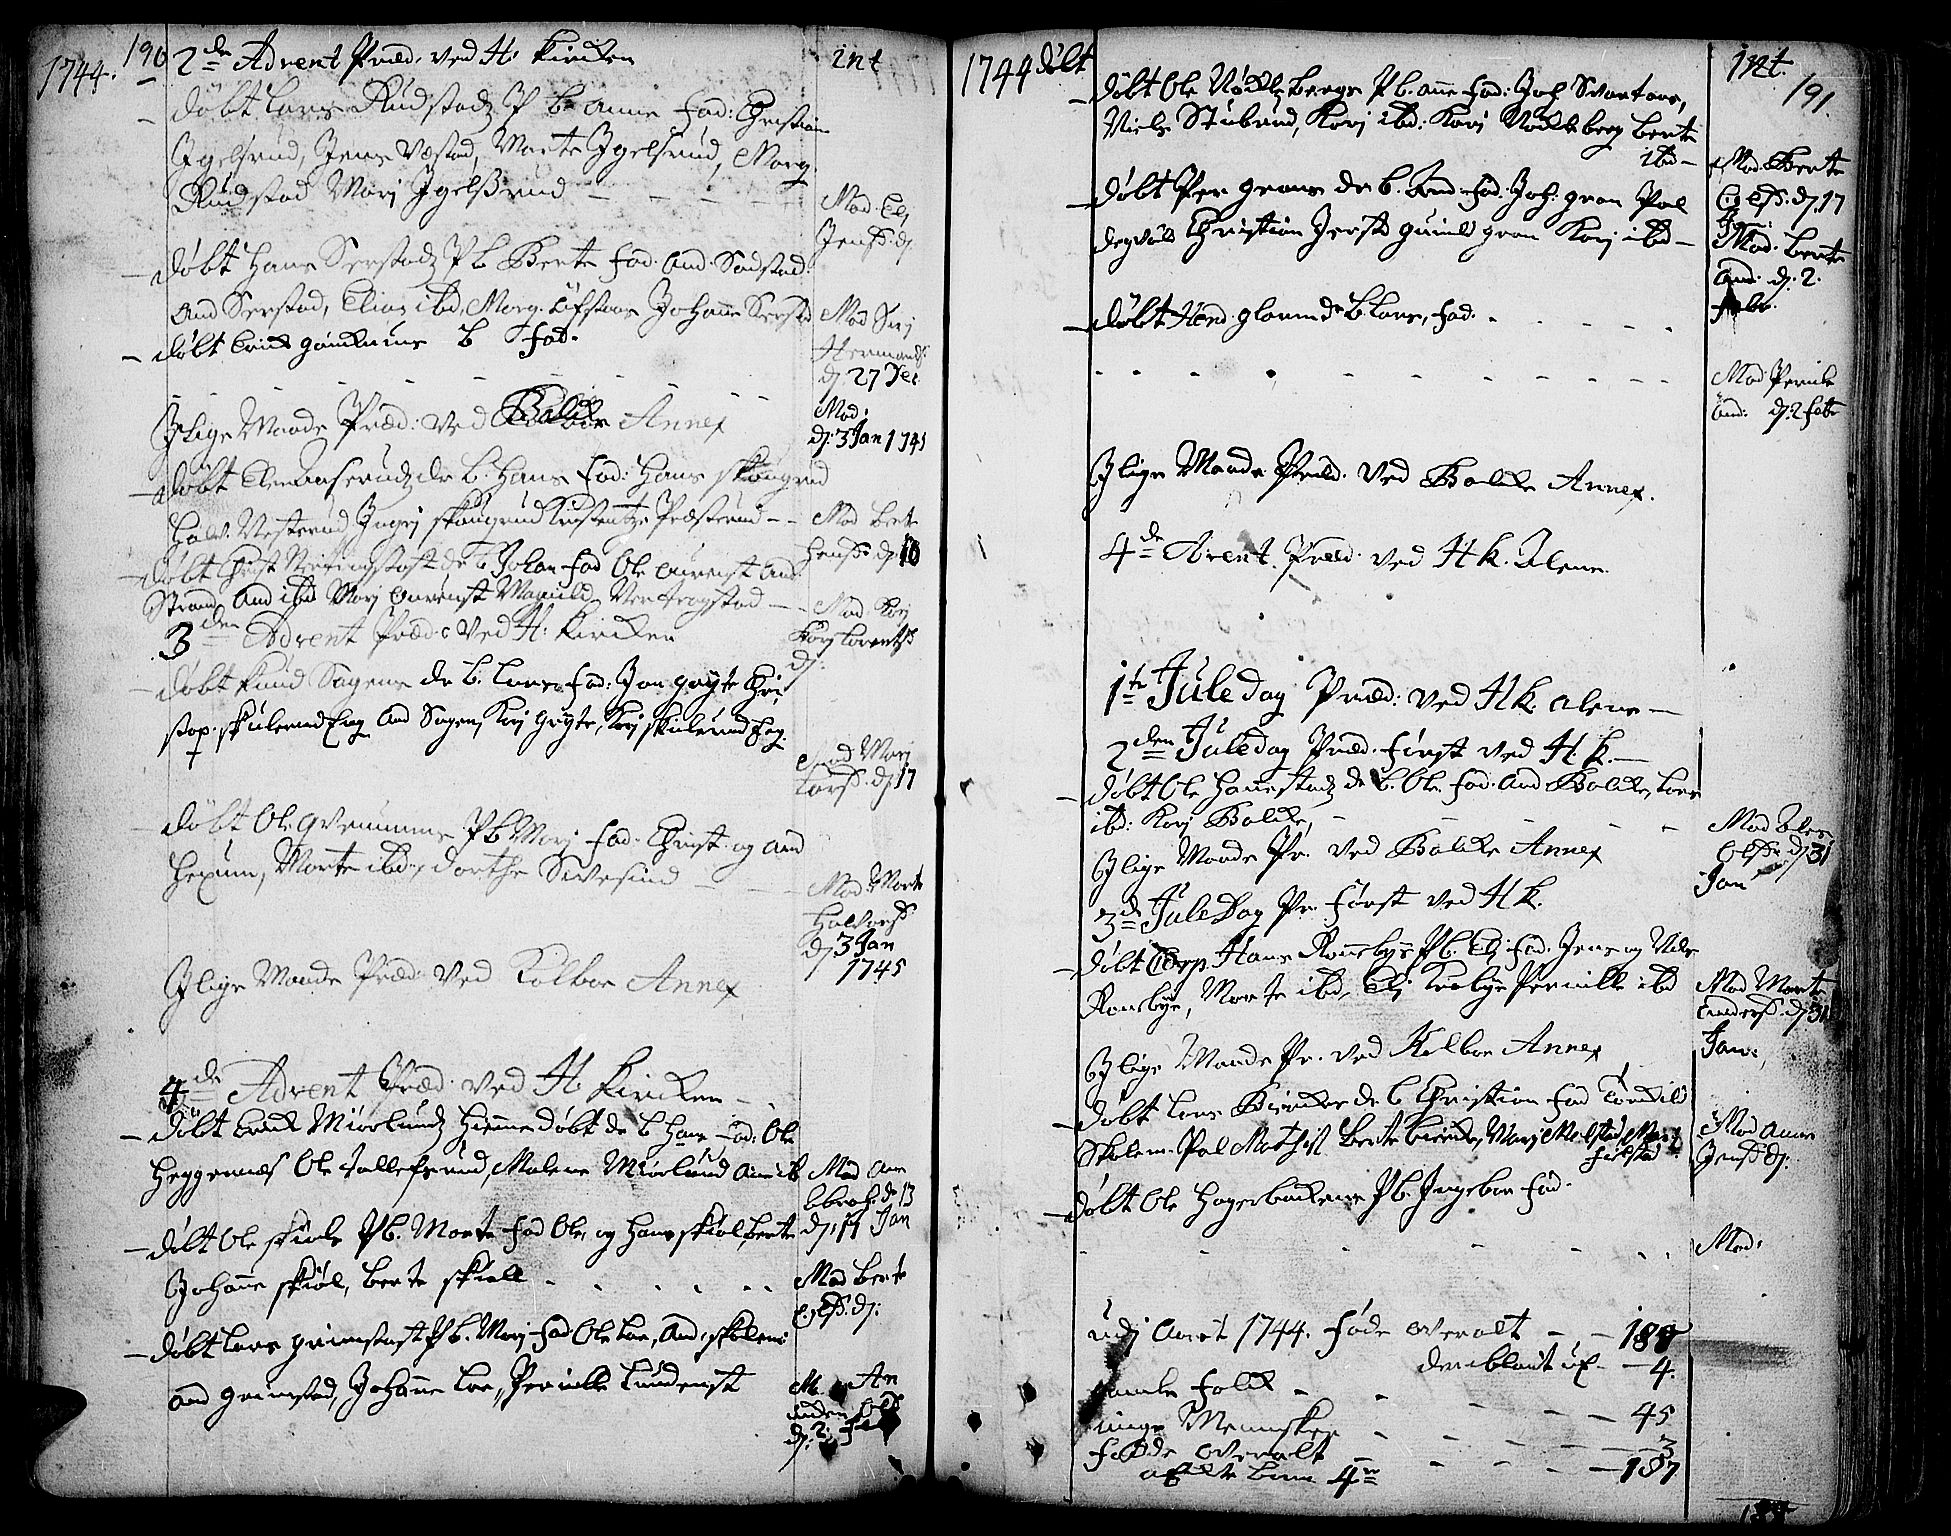 SAH, Toten prestekontor, Ministerialbok nr. 3, 1734-1751, s. 190-191